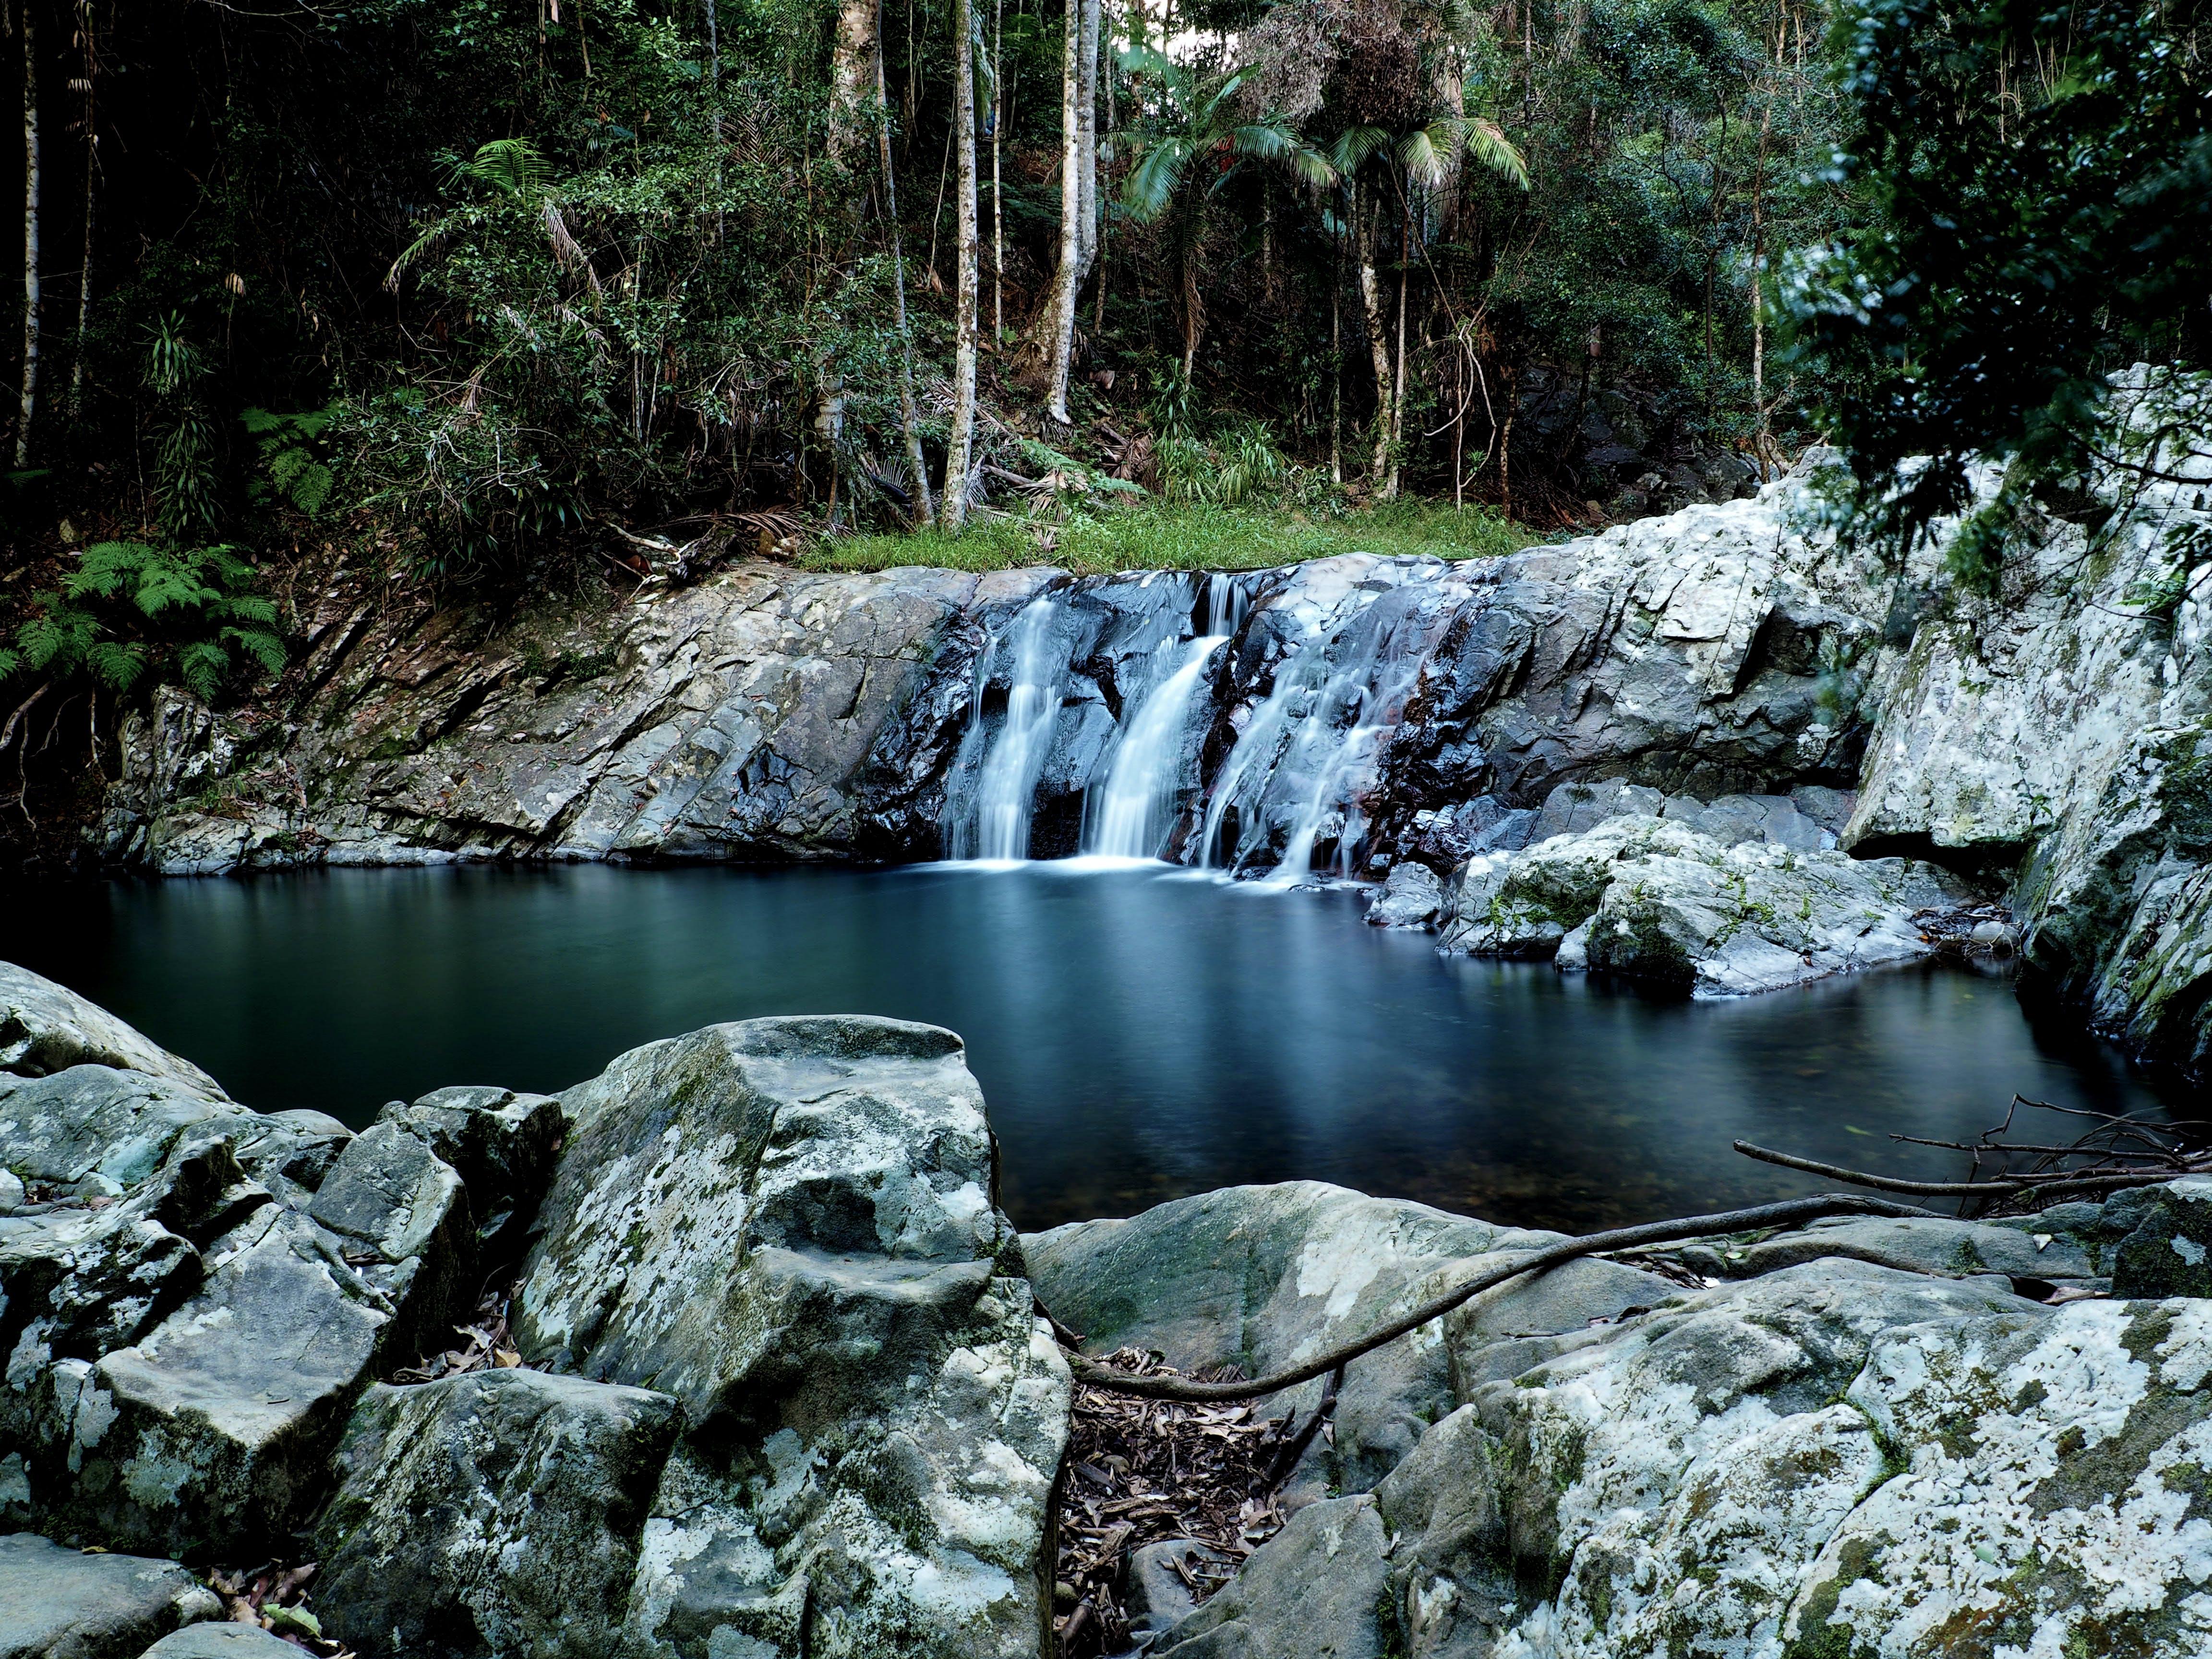 Close-up Photo of Small Waterfalls